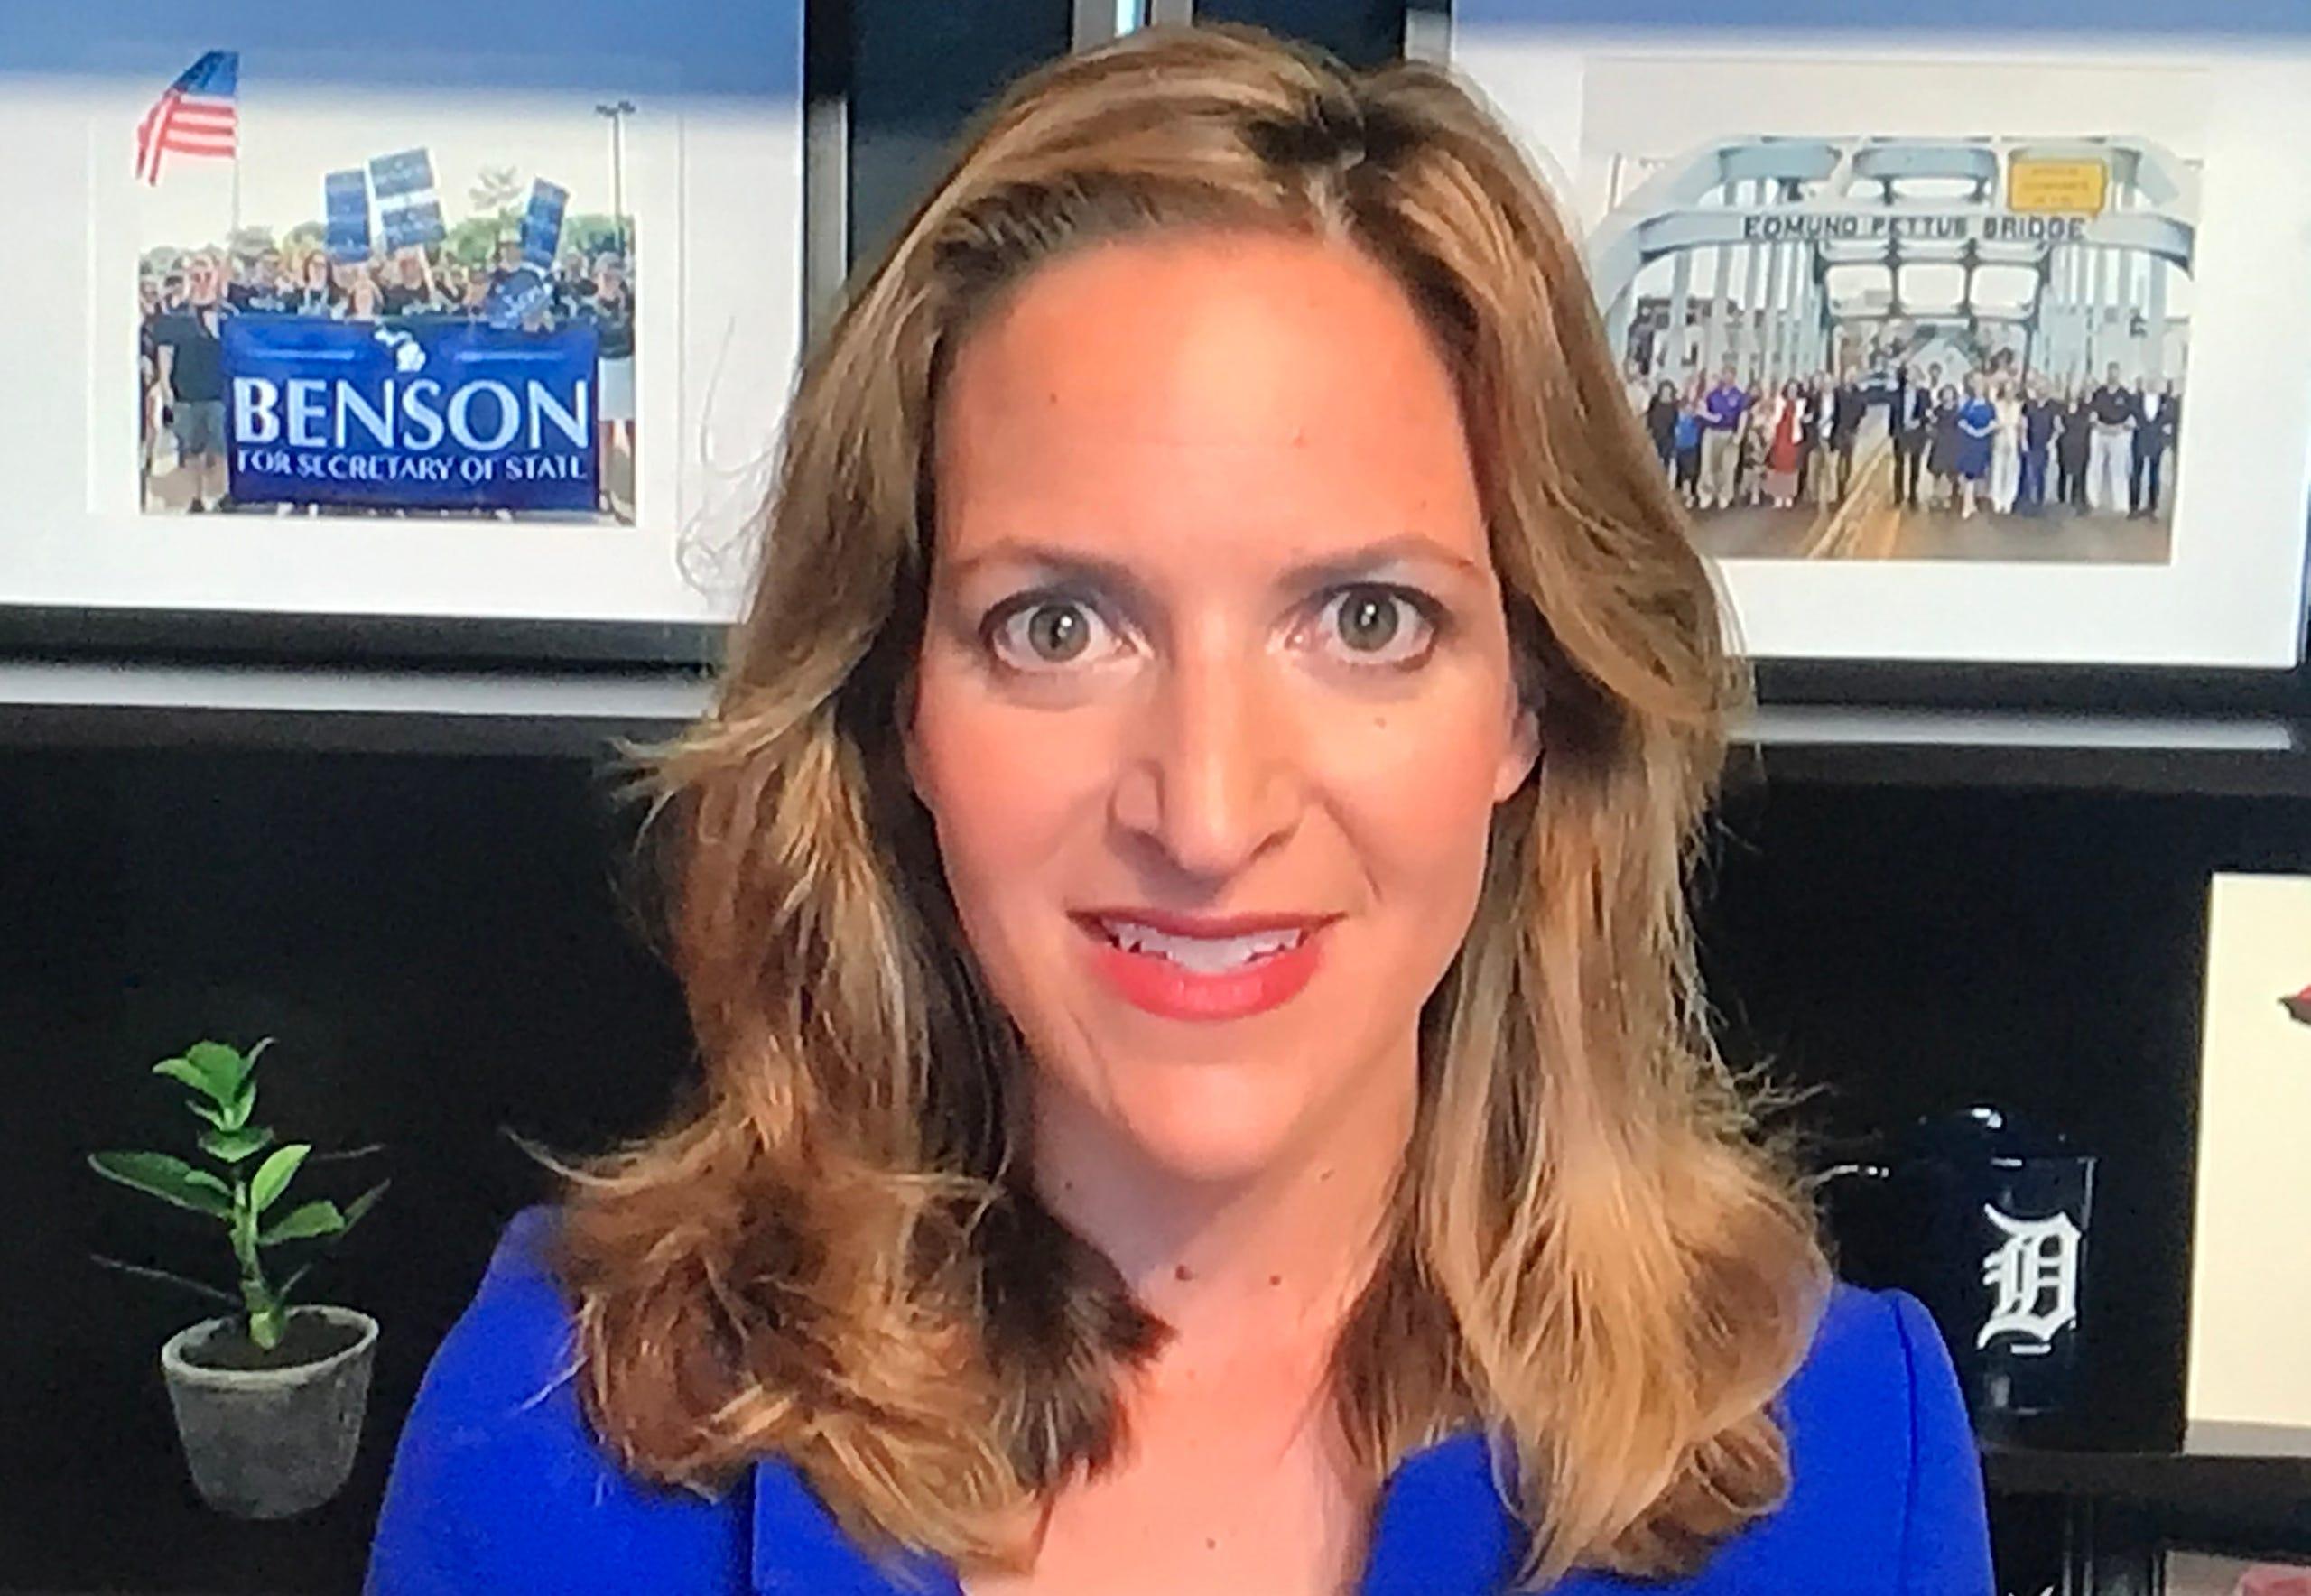 Michigan Secretary of State Jocelyn Benson speaks at Democratic National Convention on Thursday, Aug. 20, 2020.